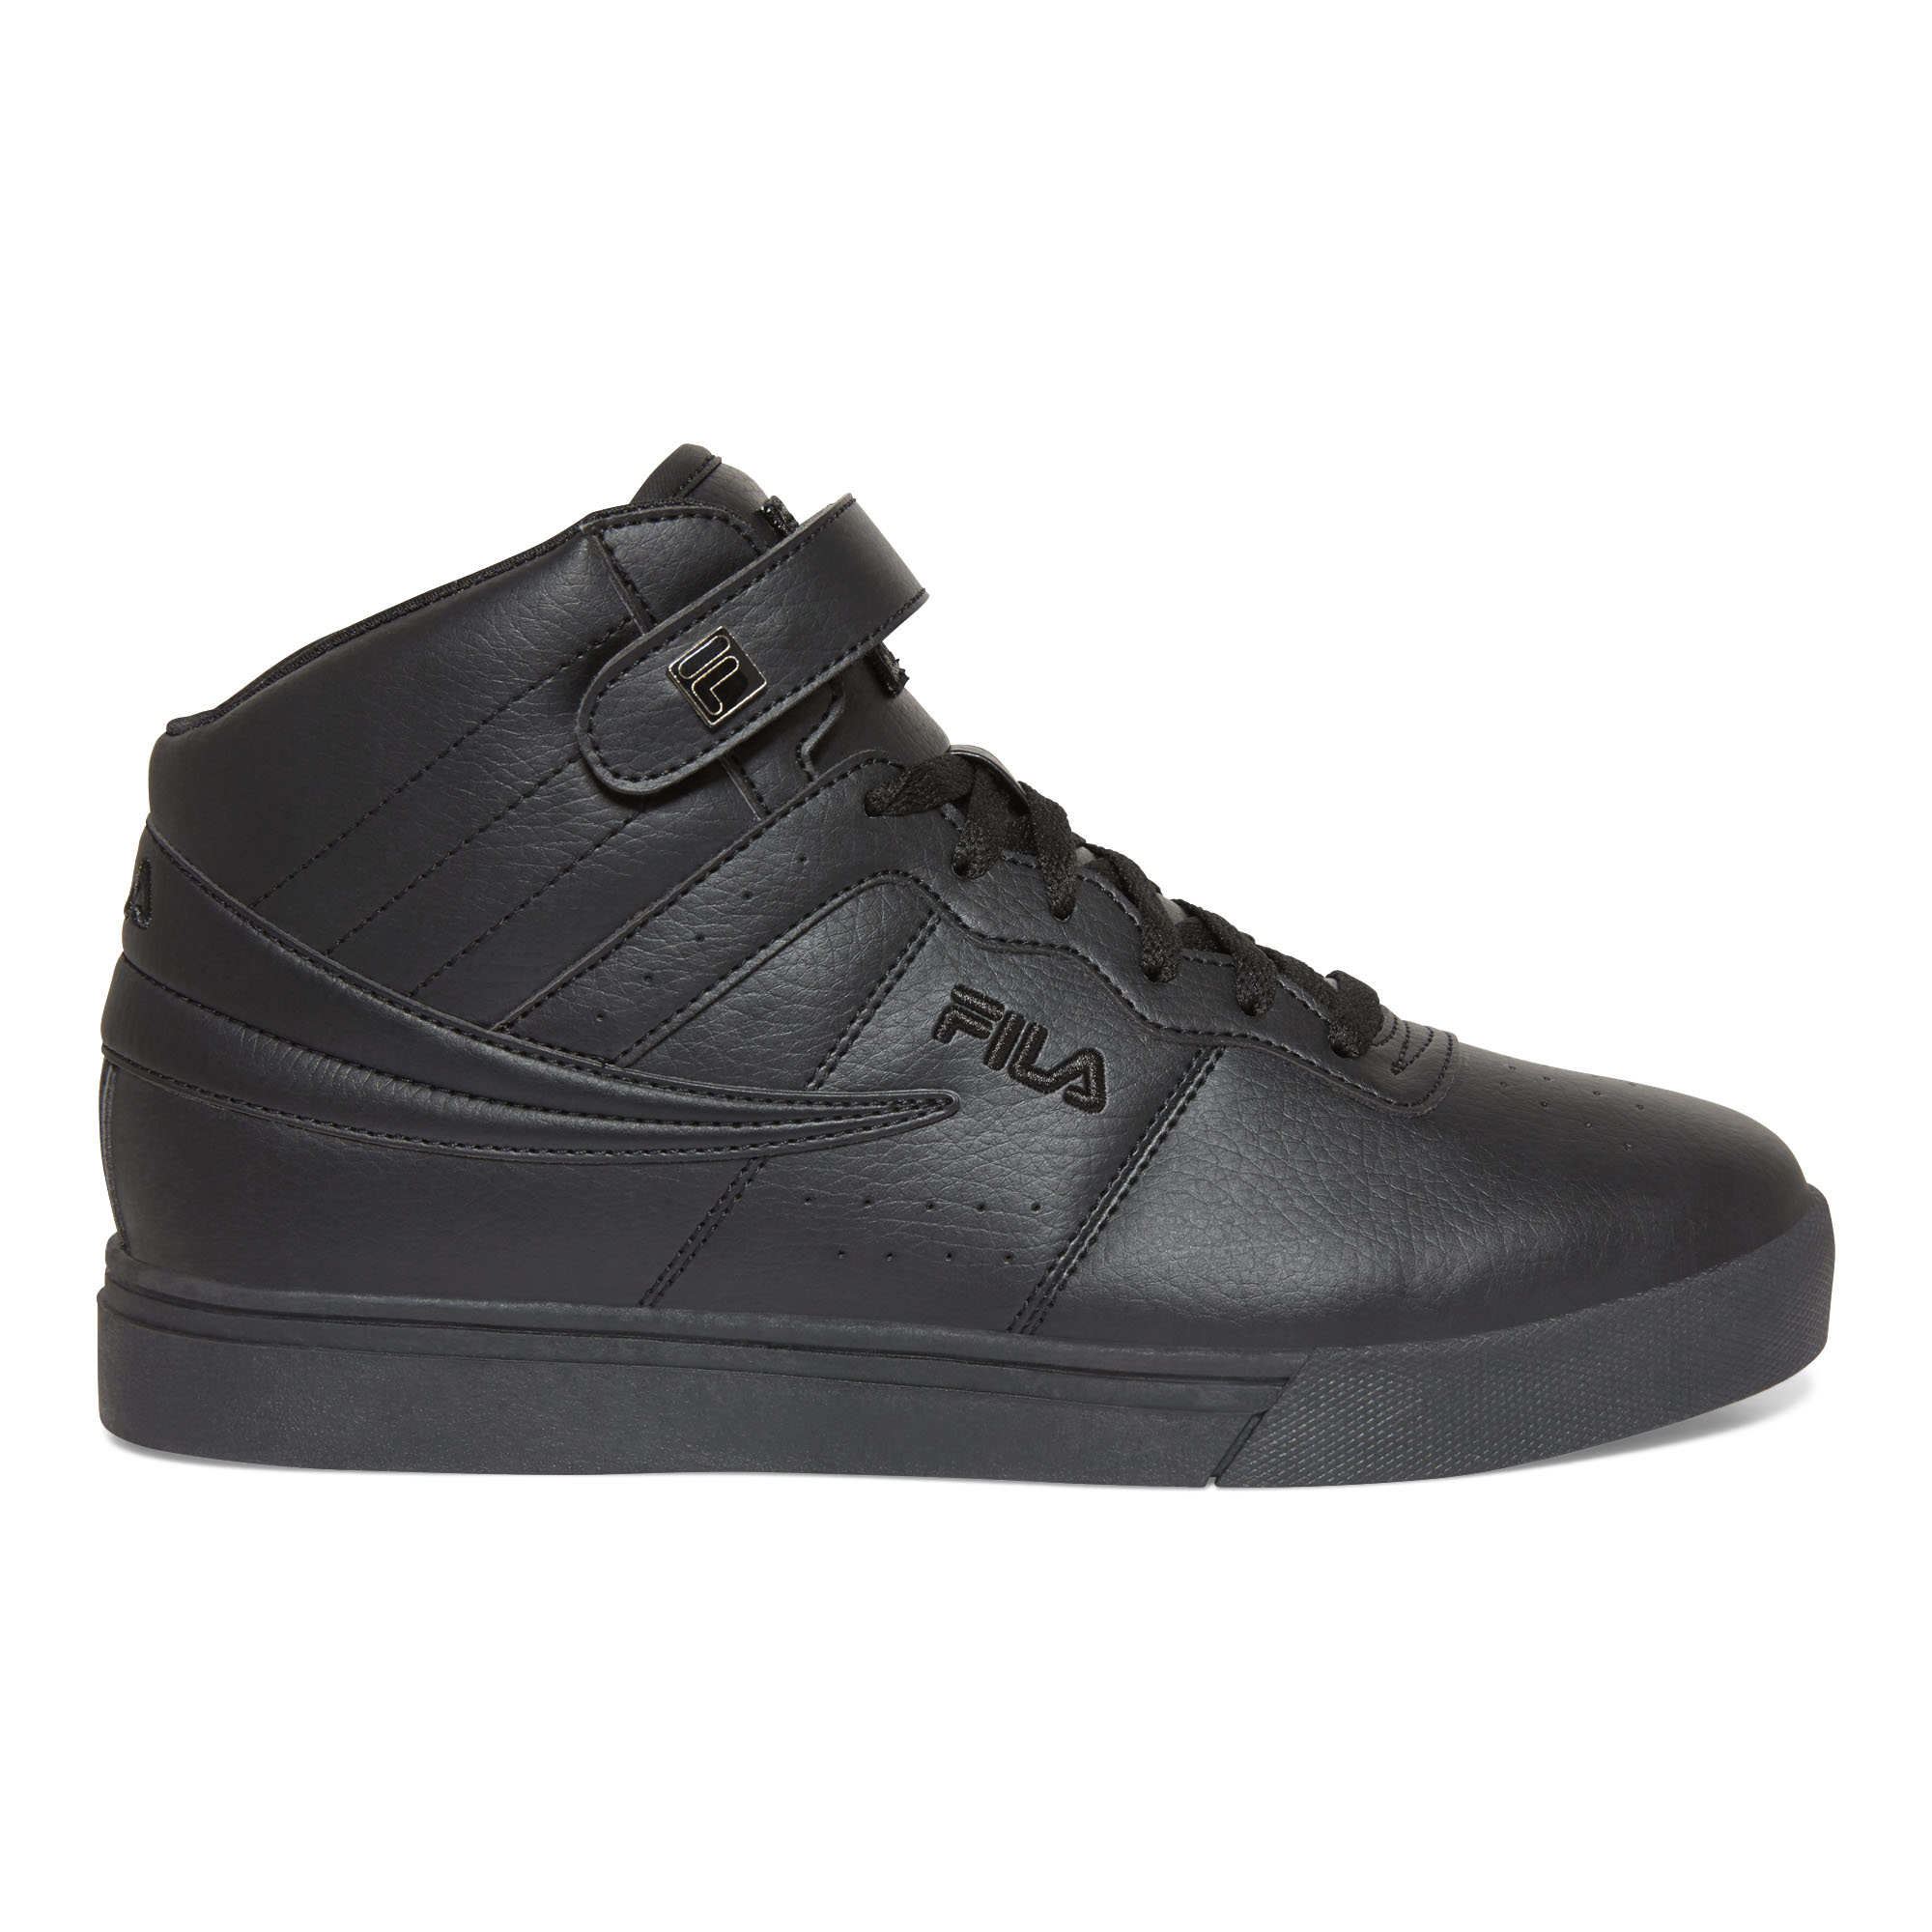 66e7e5507235 Details about Fila Men s Vulc 13 Casual Shoe